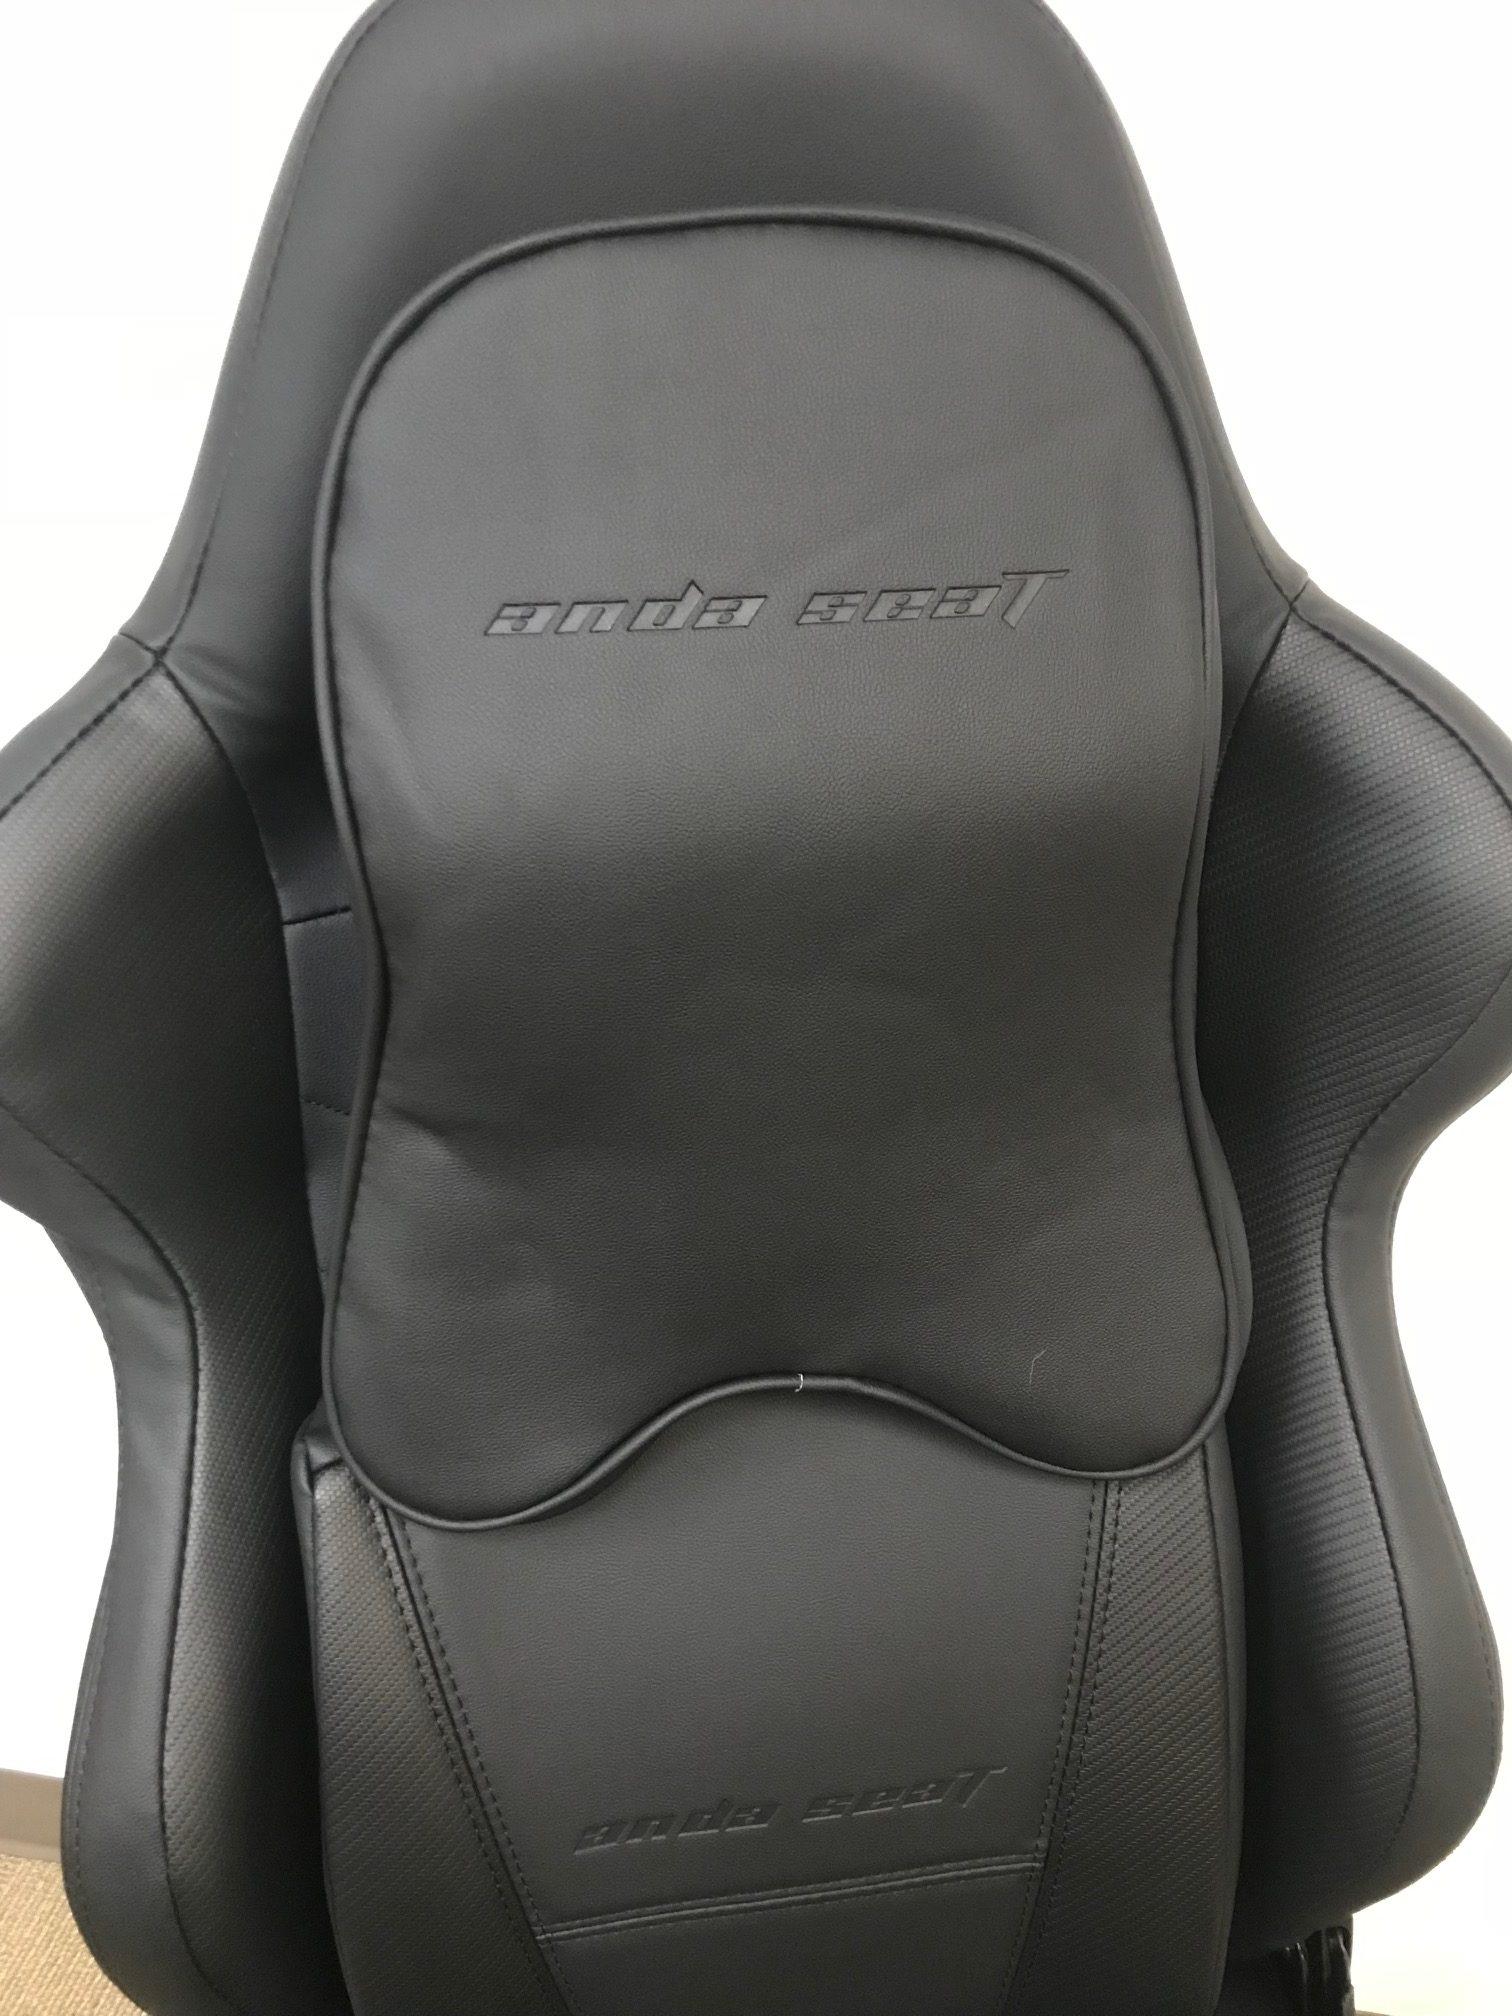 AndaSeat Dark Wizard Gaming Chair 6